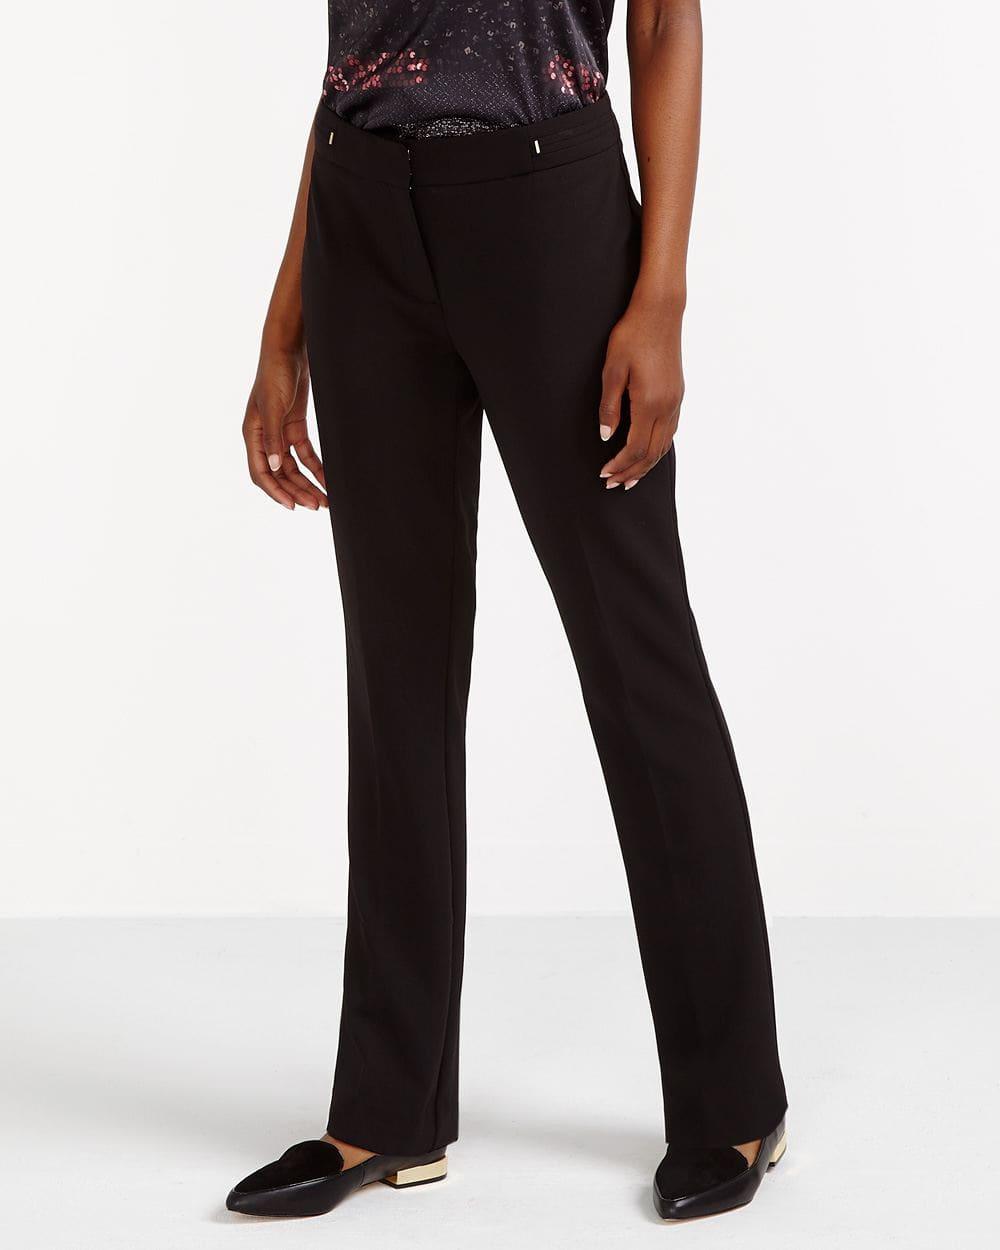 Solid Boot Cut Pants